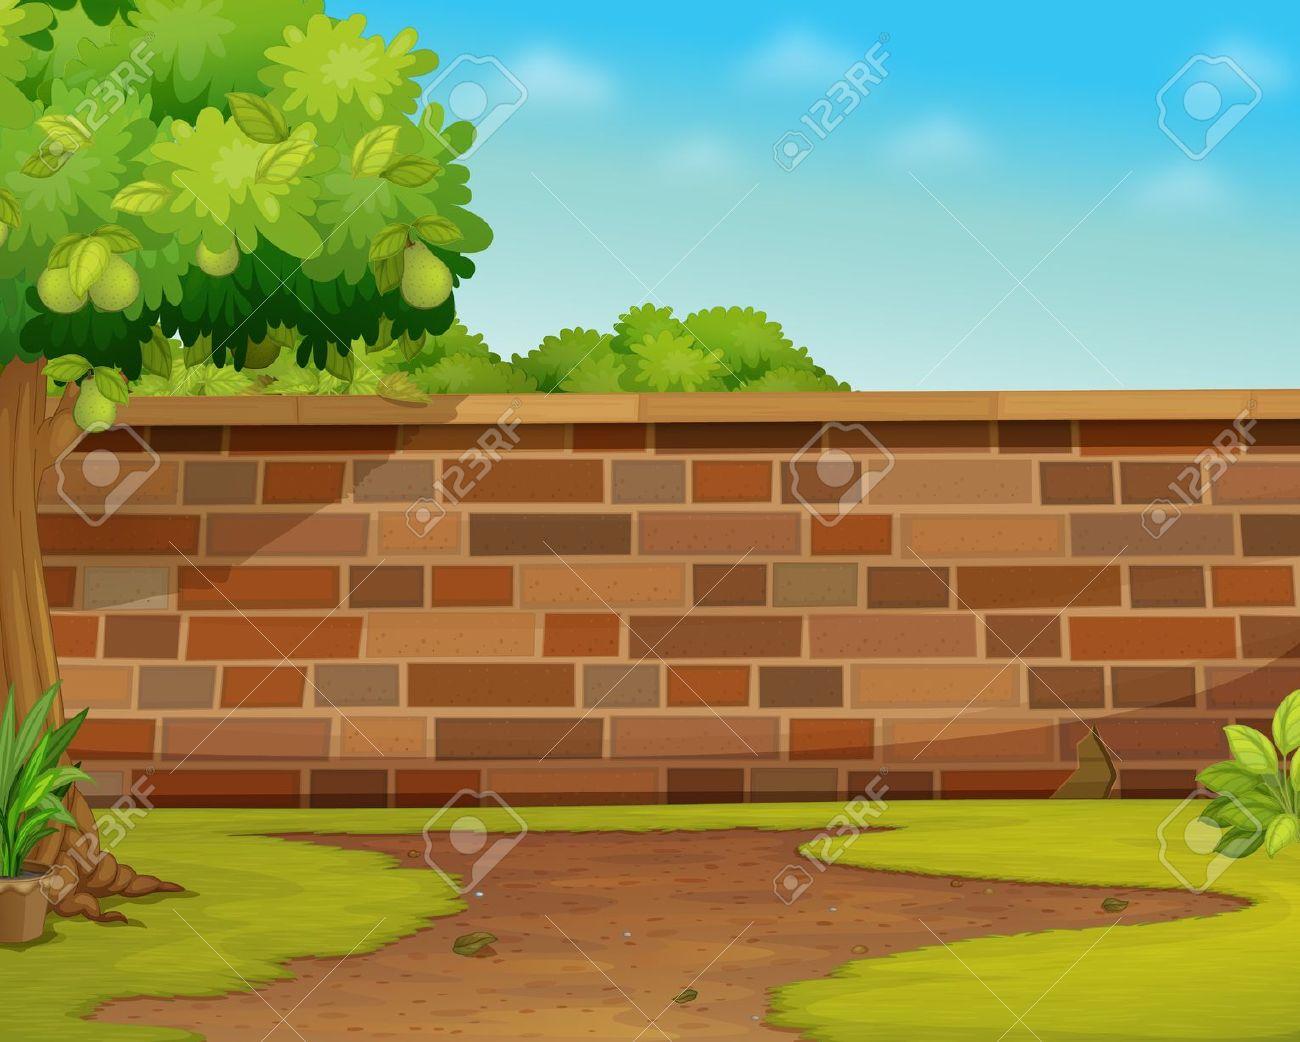 Garden Wall Clipart.